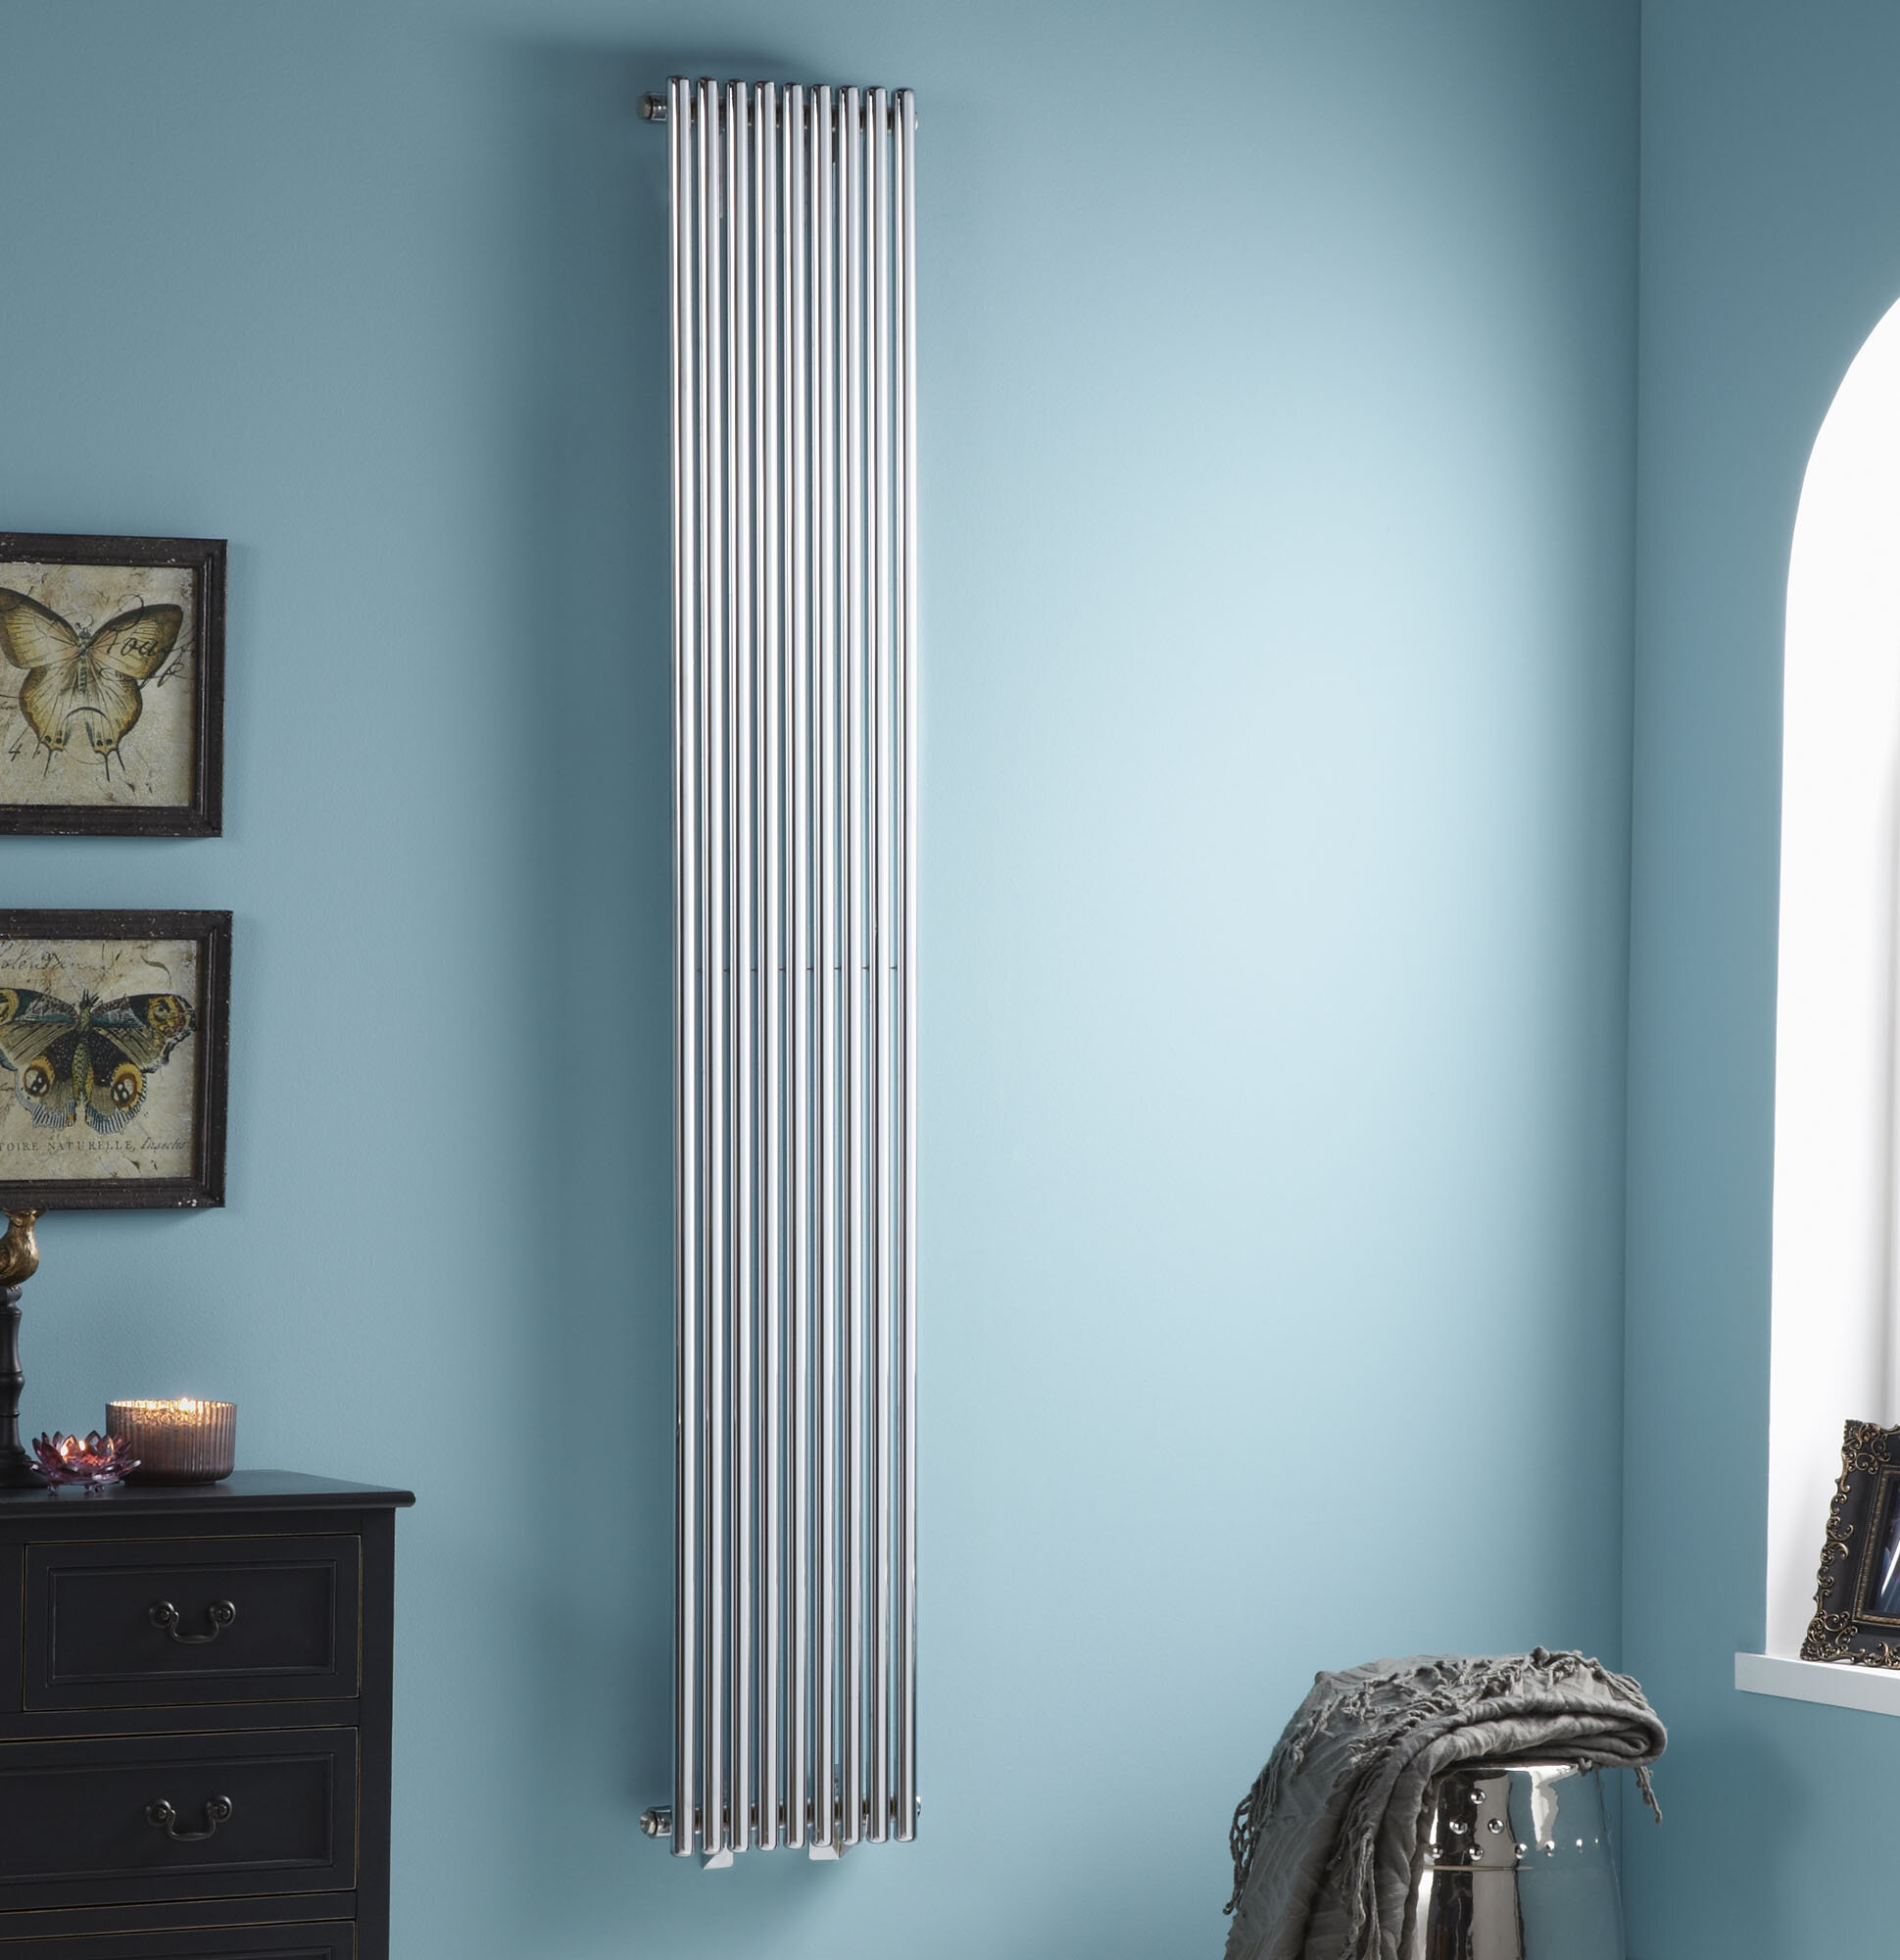 Belfry Heating Iridio Small Vertical Designer Radiator | Wayfair.co.uk